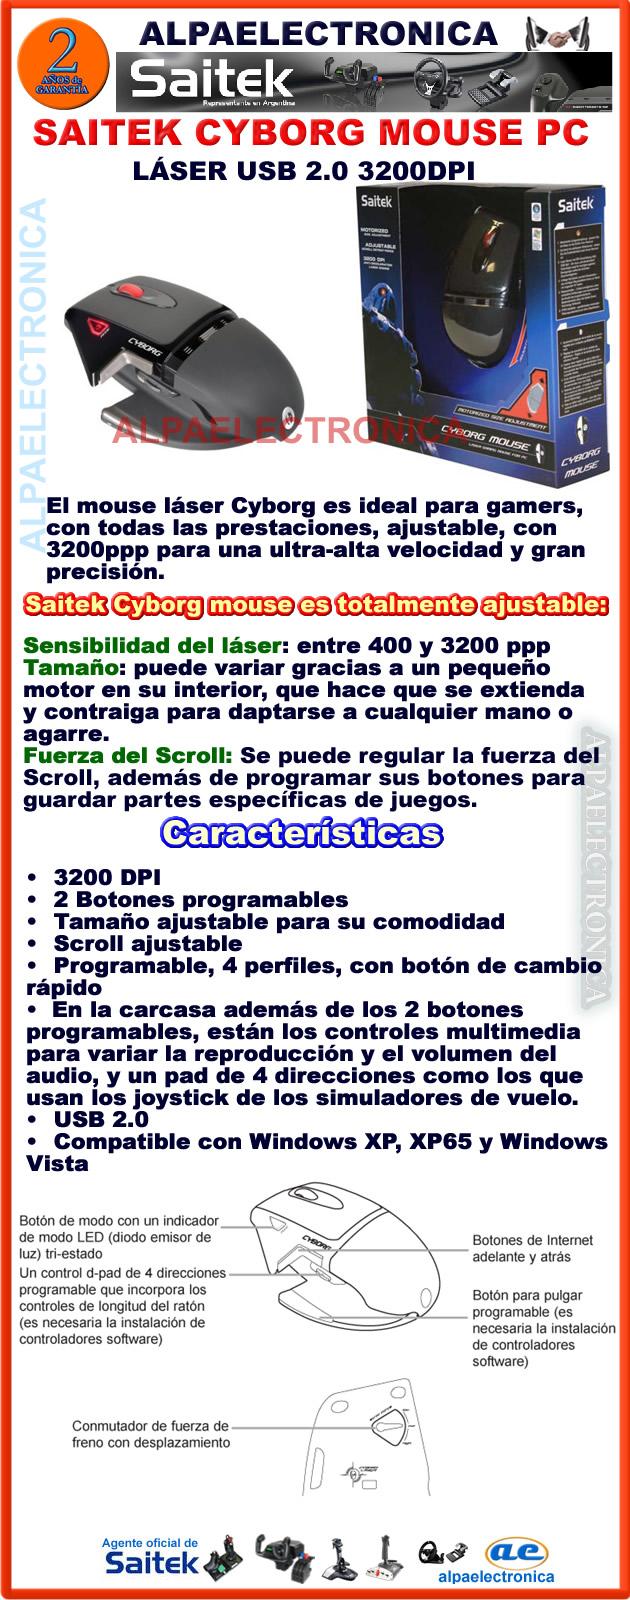 SAITEK CYBORG MOUSE GAMING www.alpaelectronica.com.ar